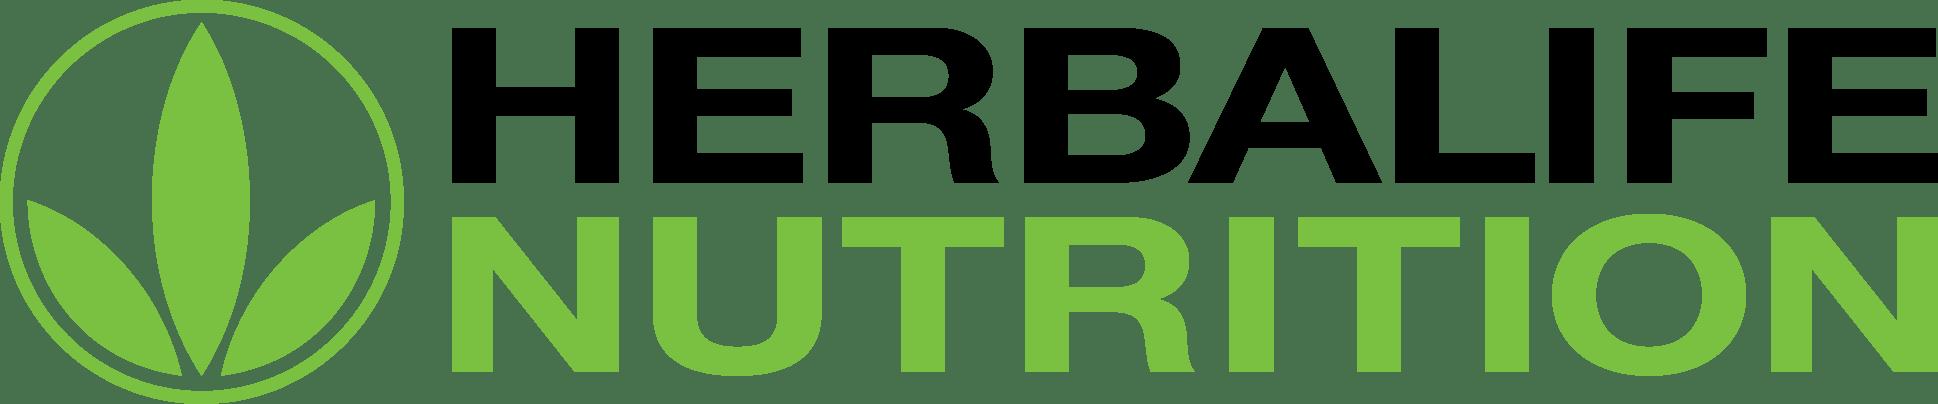 Herbalife_Nutrition_Logo_2016